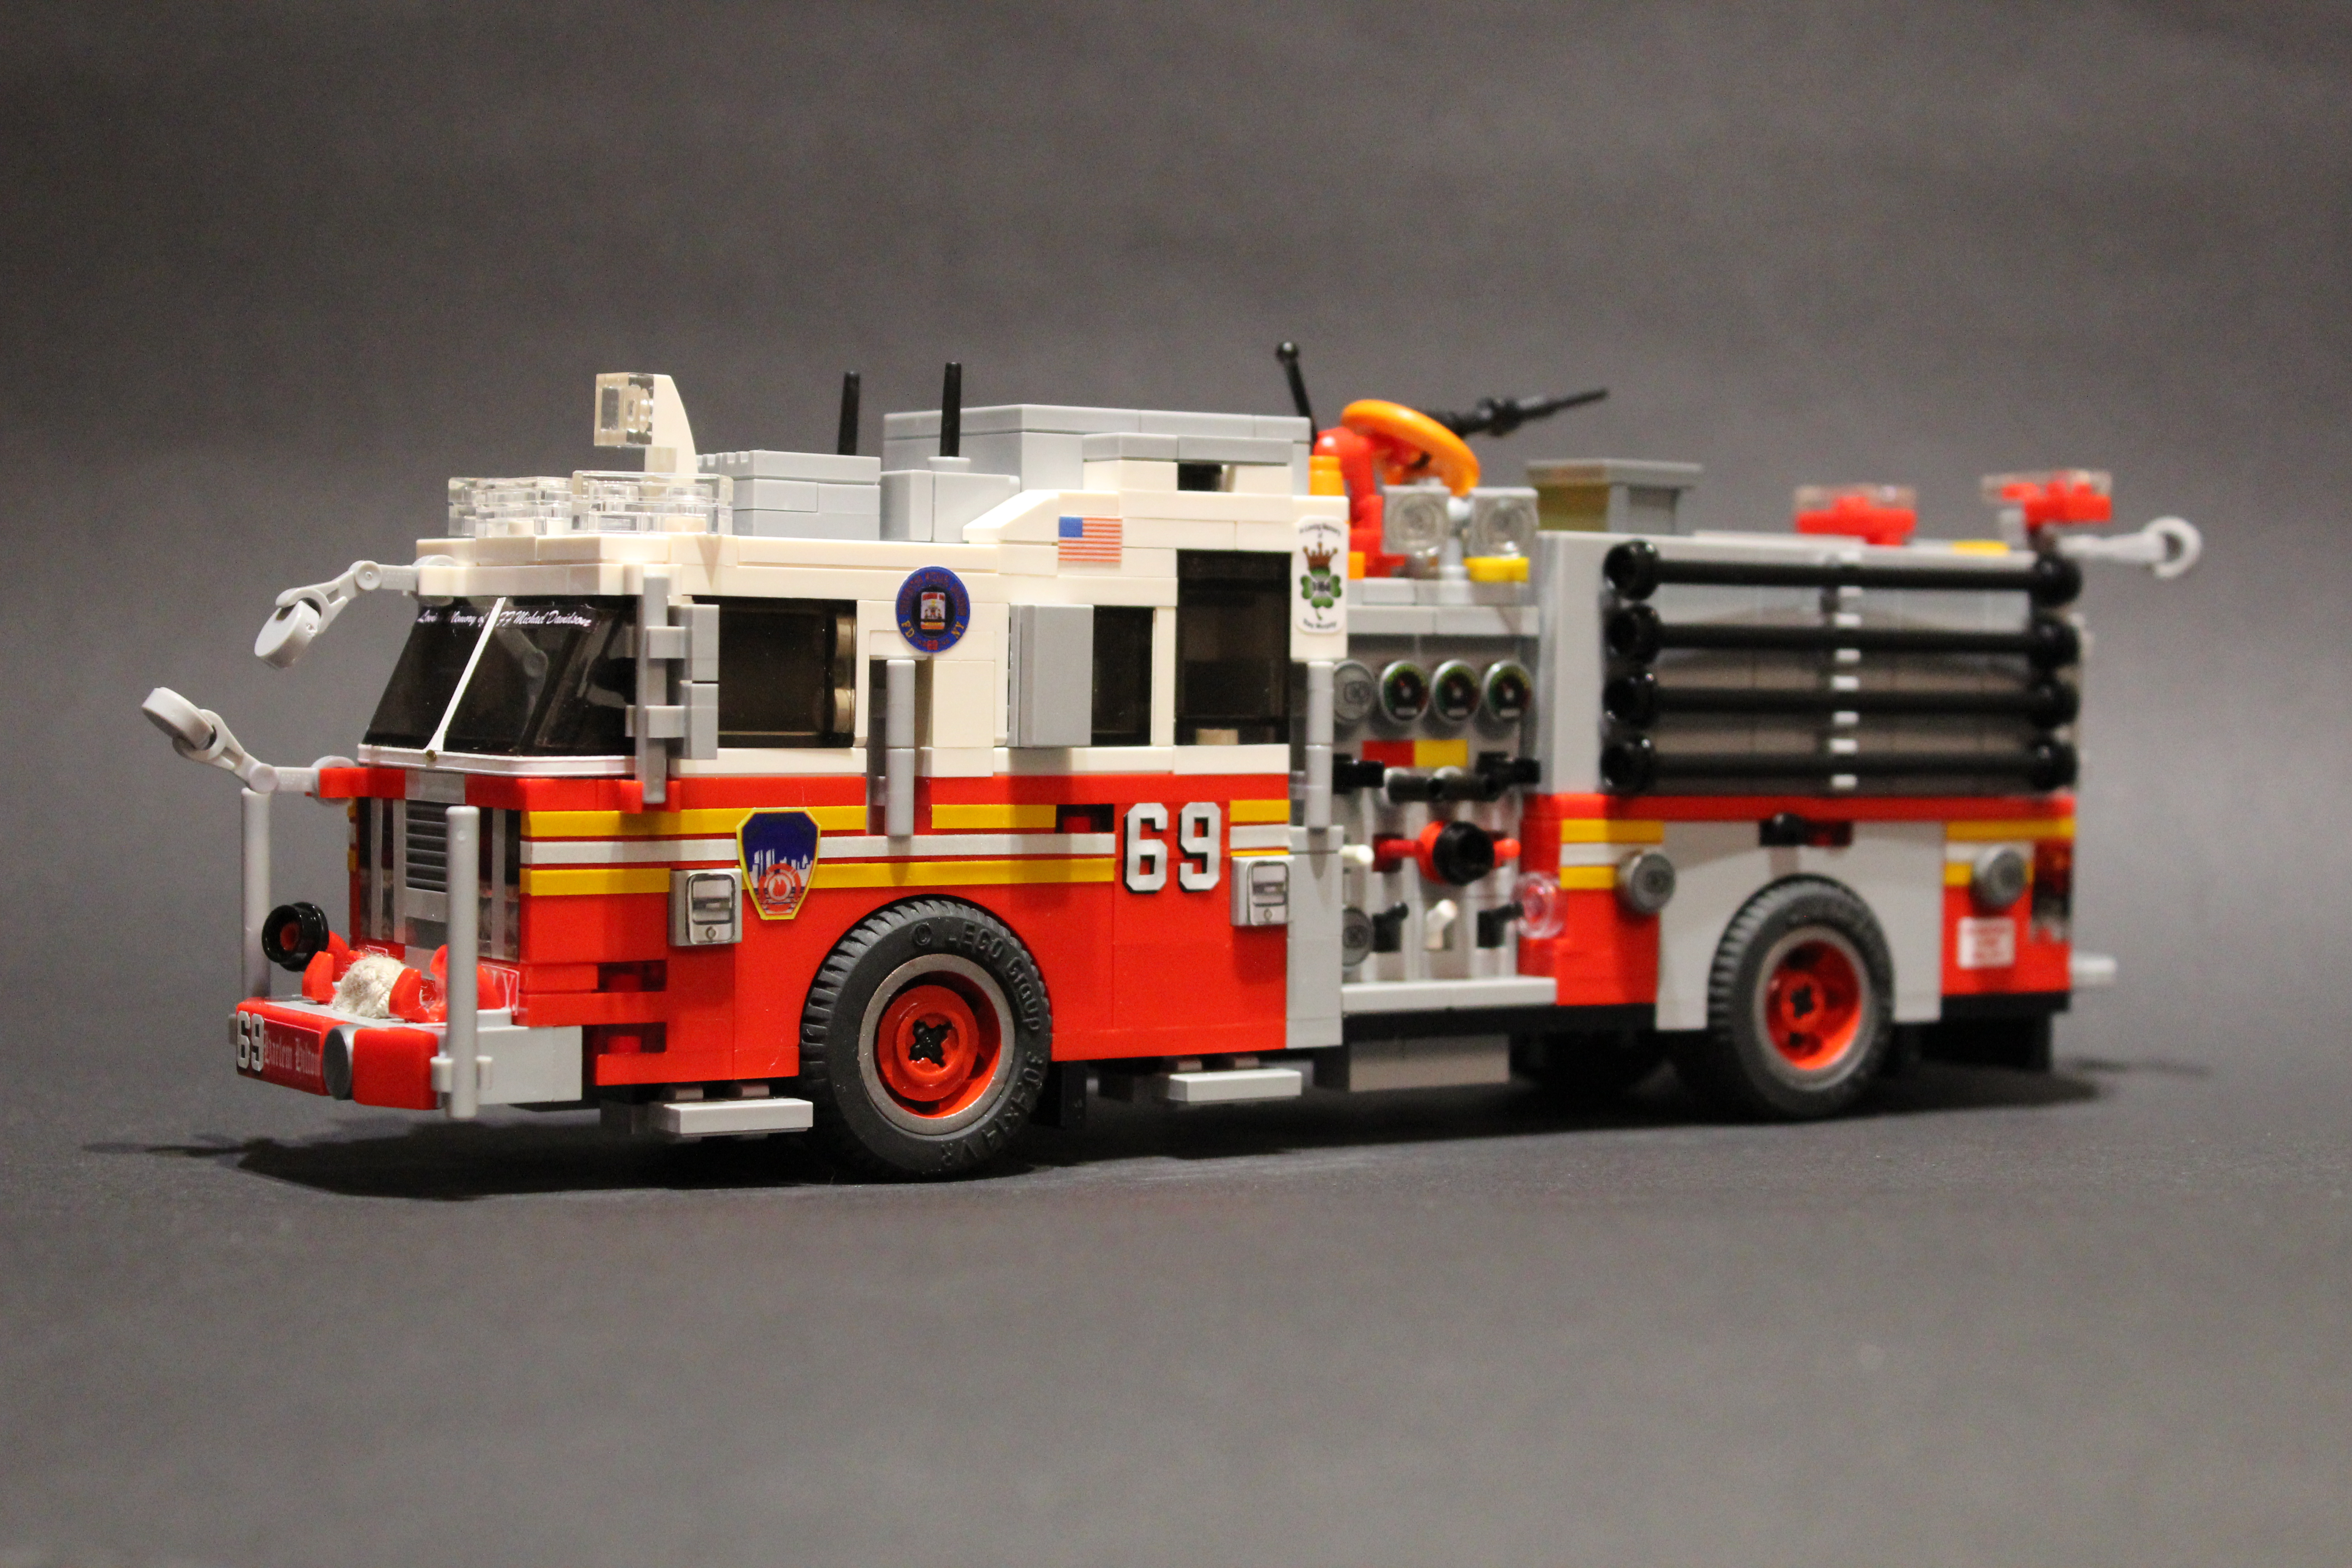 FDNY Engine 69 Harlem Hilton